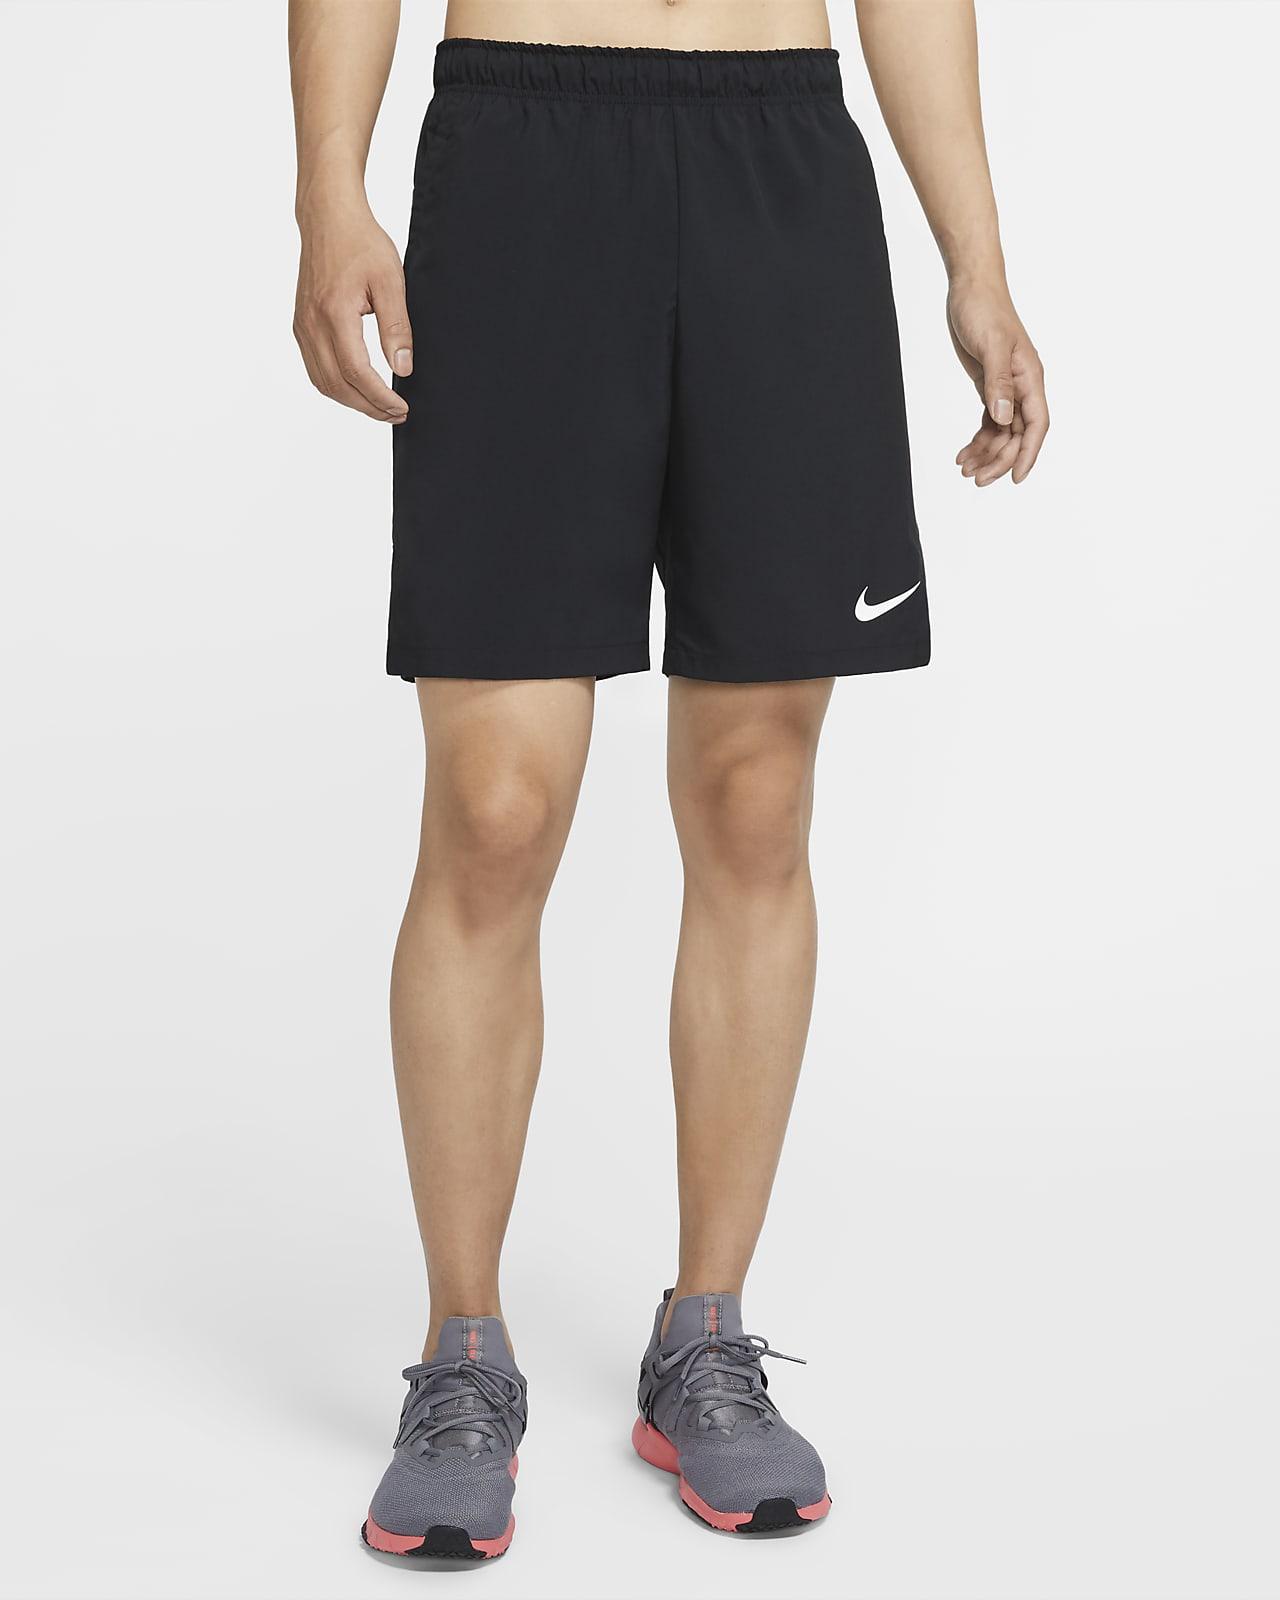 Nike Flex Pantalón corto de entrenamiento de tejido Woven - Hombre